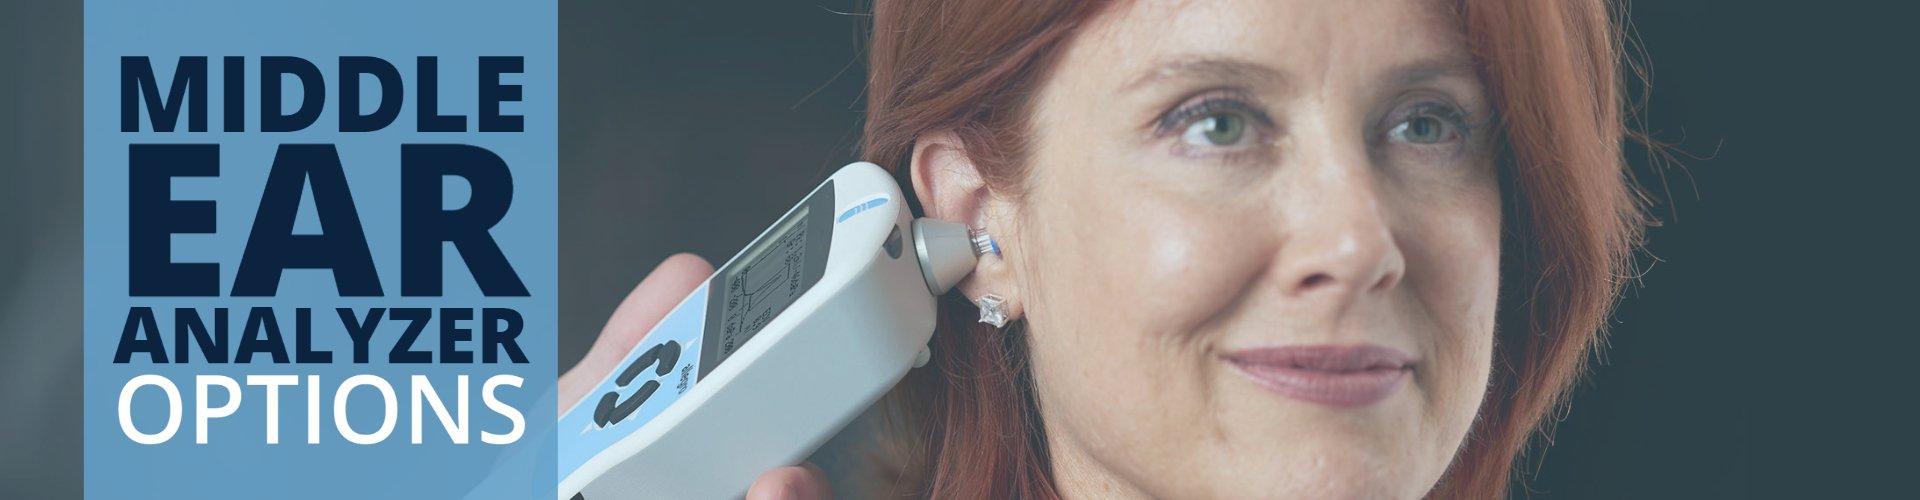 gsi-middle-ear-analyzer-options